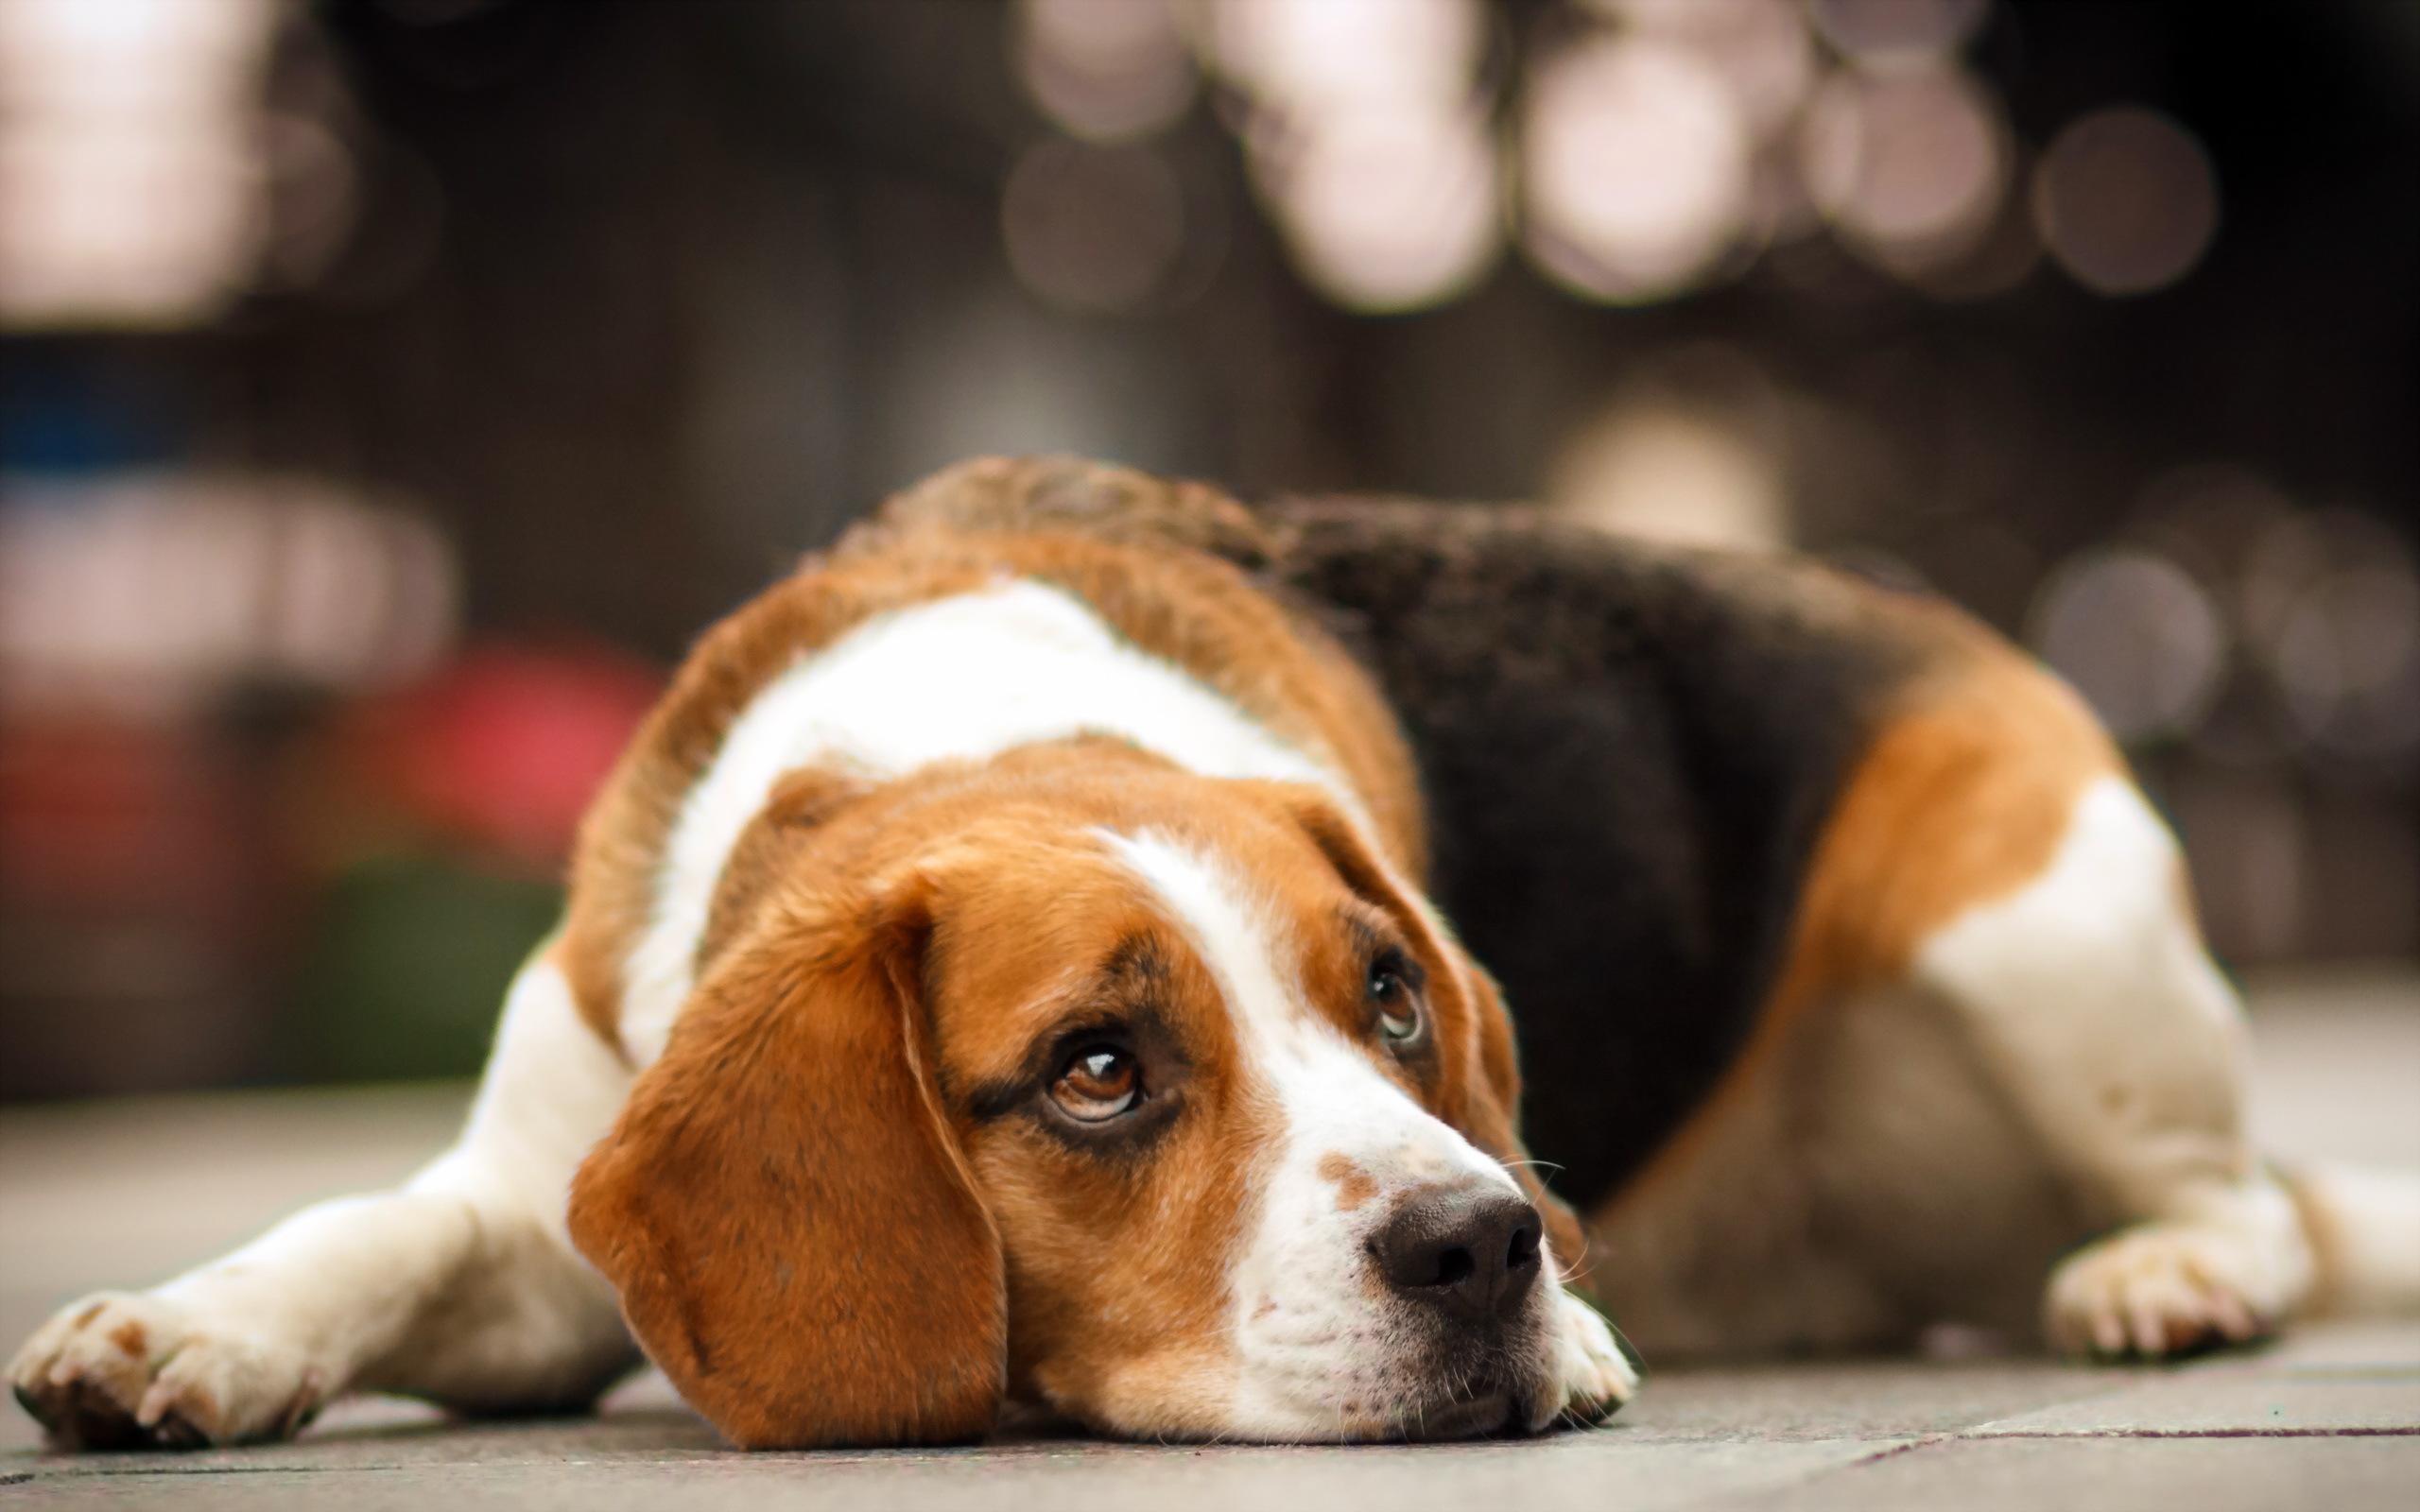 beagle dog wide wallpaper hd 50046